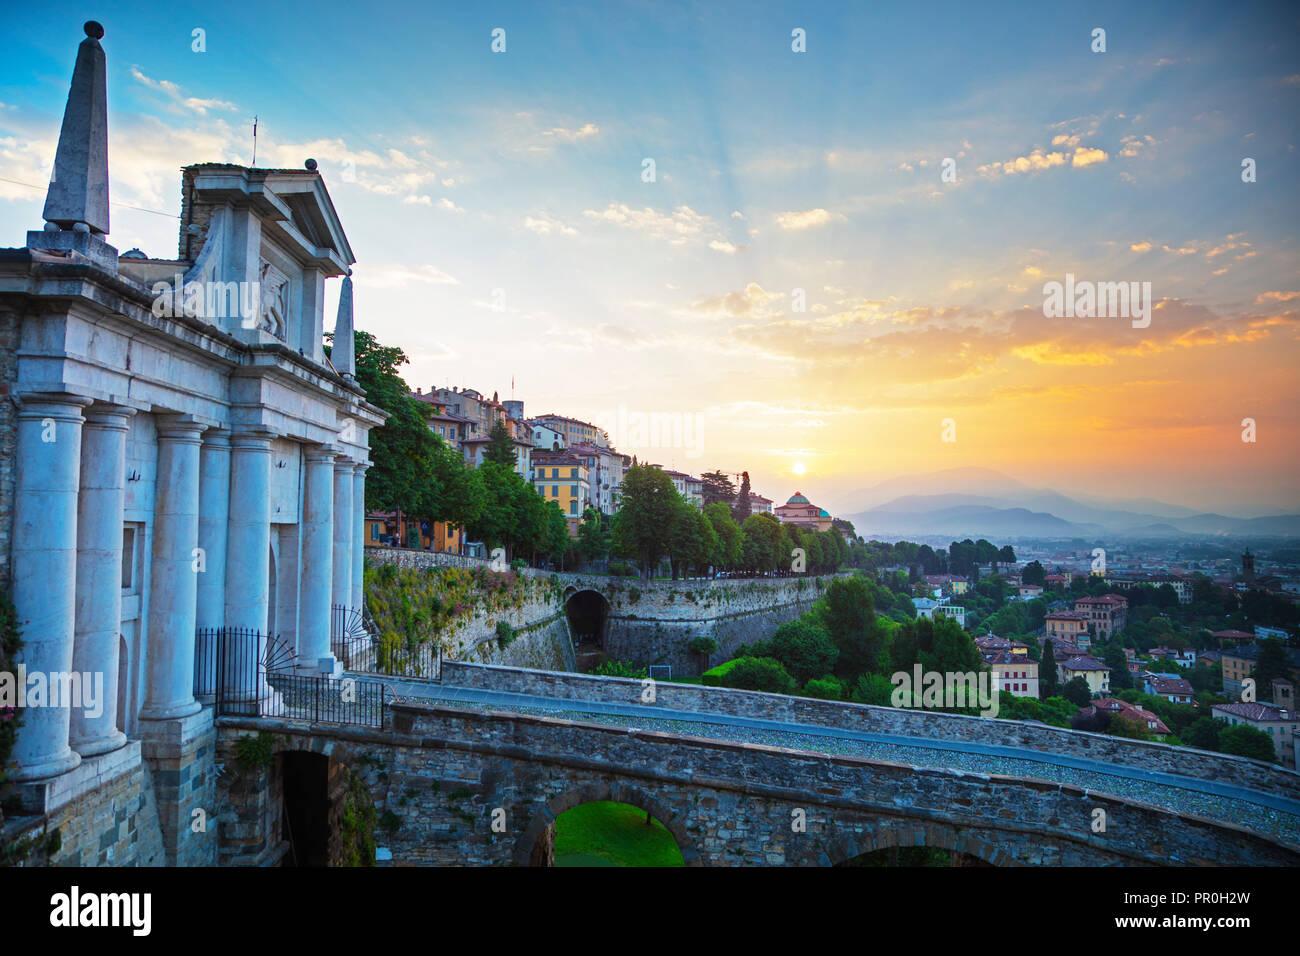 City view from Porta San Giacomo, Upper Town (Citta Alta), Bergamo, Lombardy, Italy, Europe - Stock Image